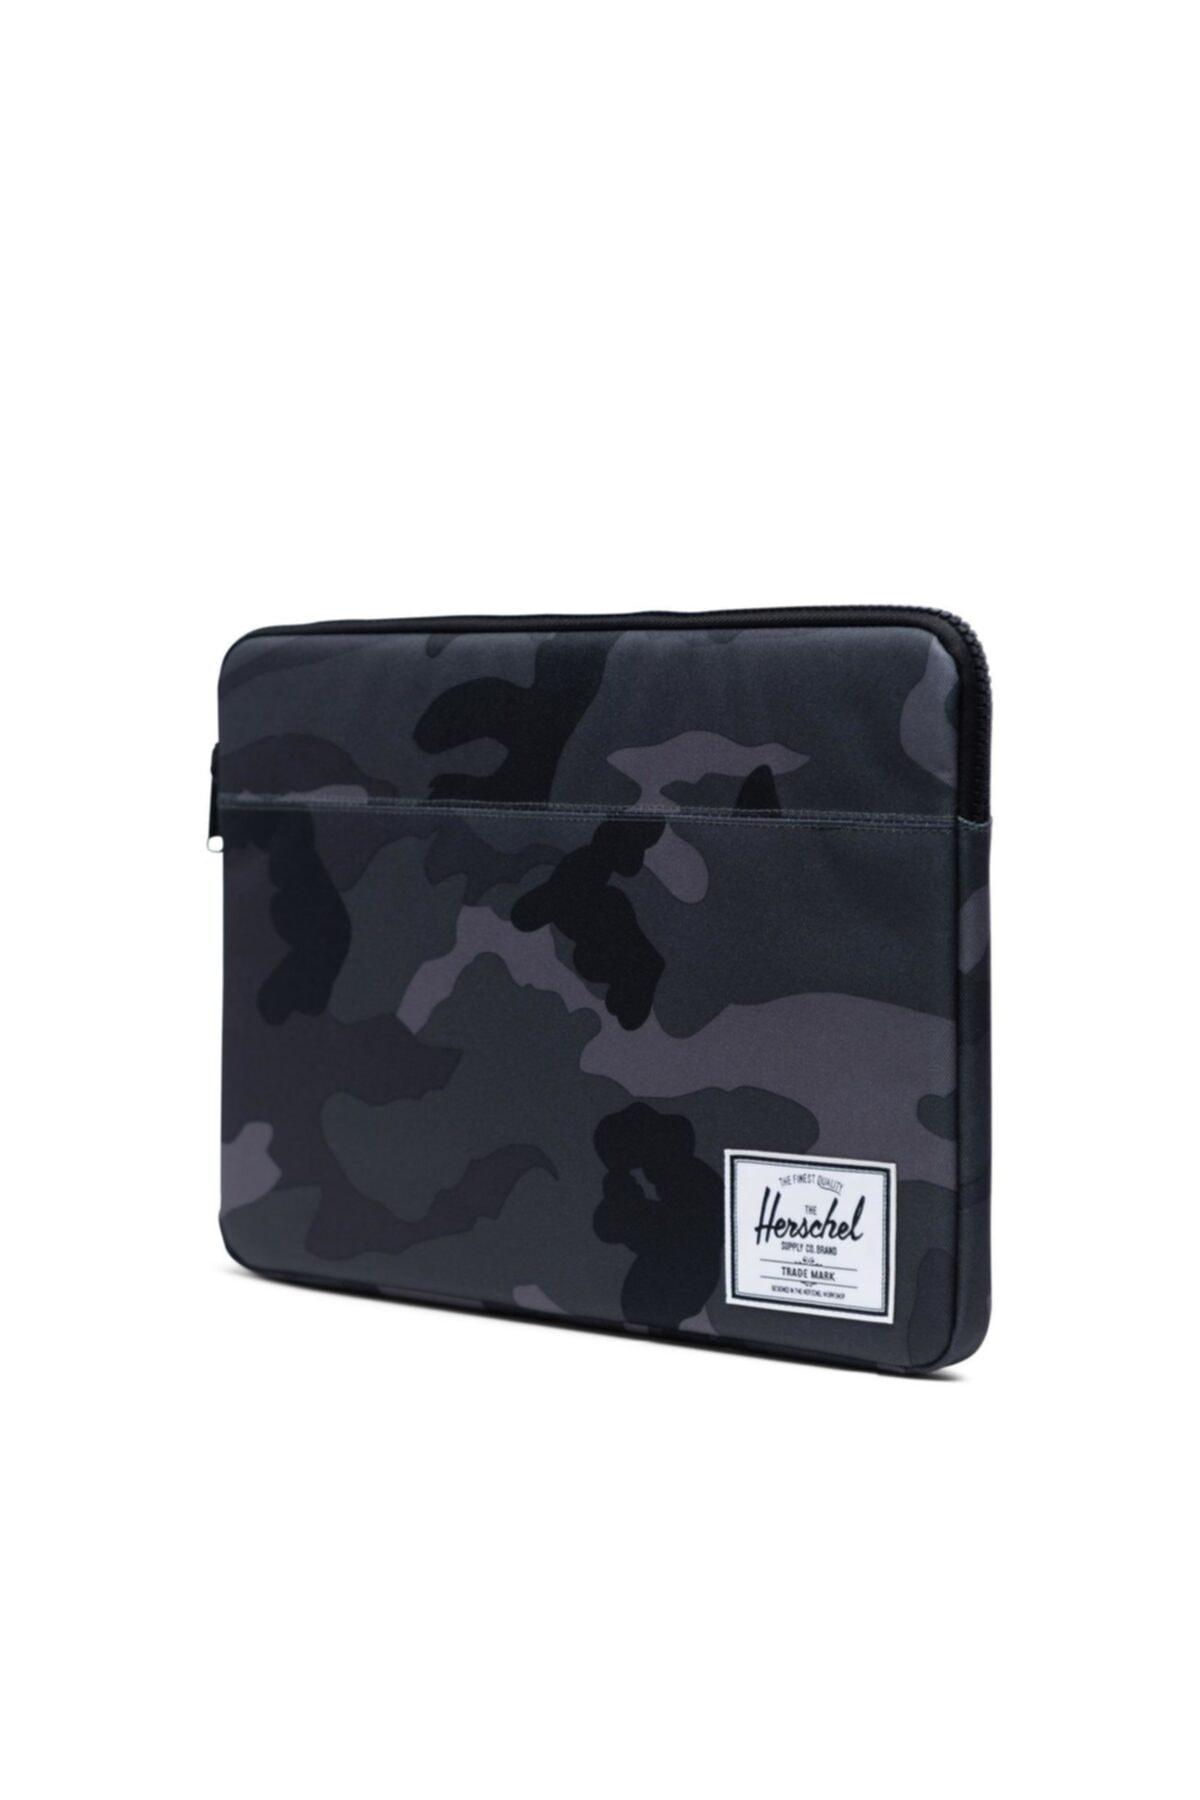 Herschel Supply Co. Herschel Supply Laptop Kılıfı Anchor Sleeve For 15 Inch Macbook Night Camo 2